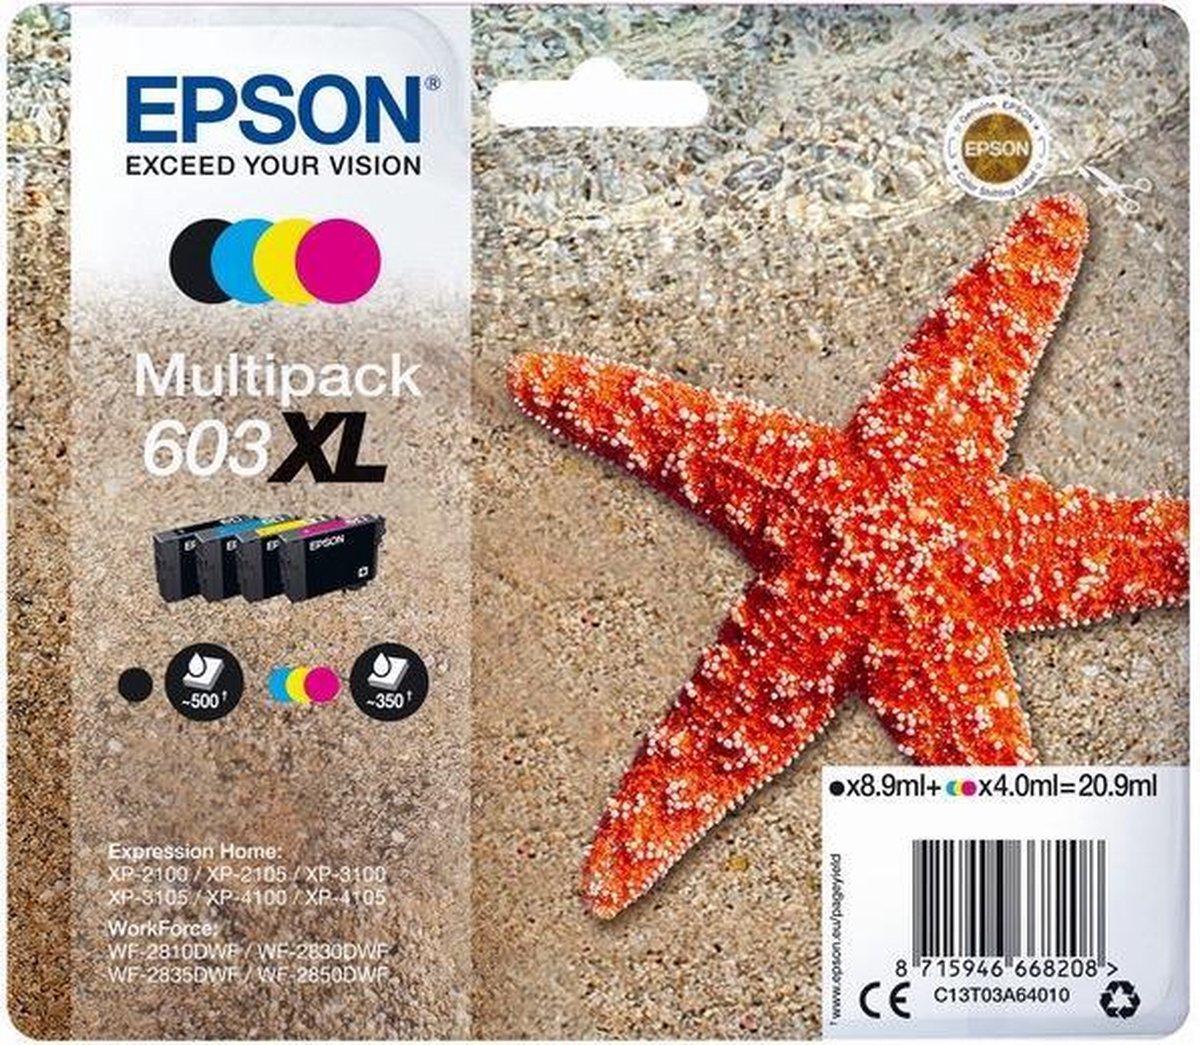 Epson 603XL - Inktcartridge / Multipack